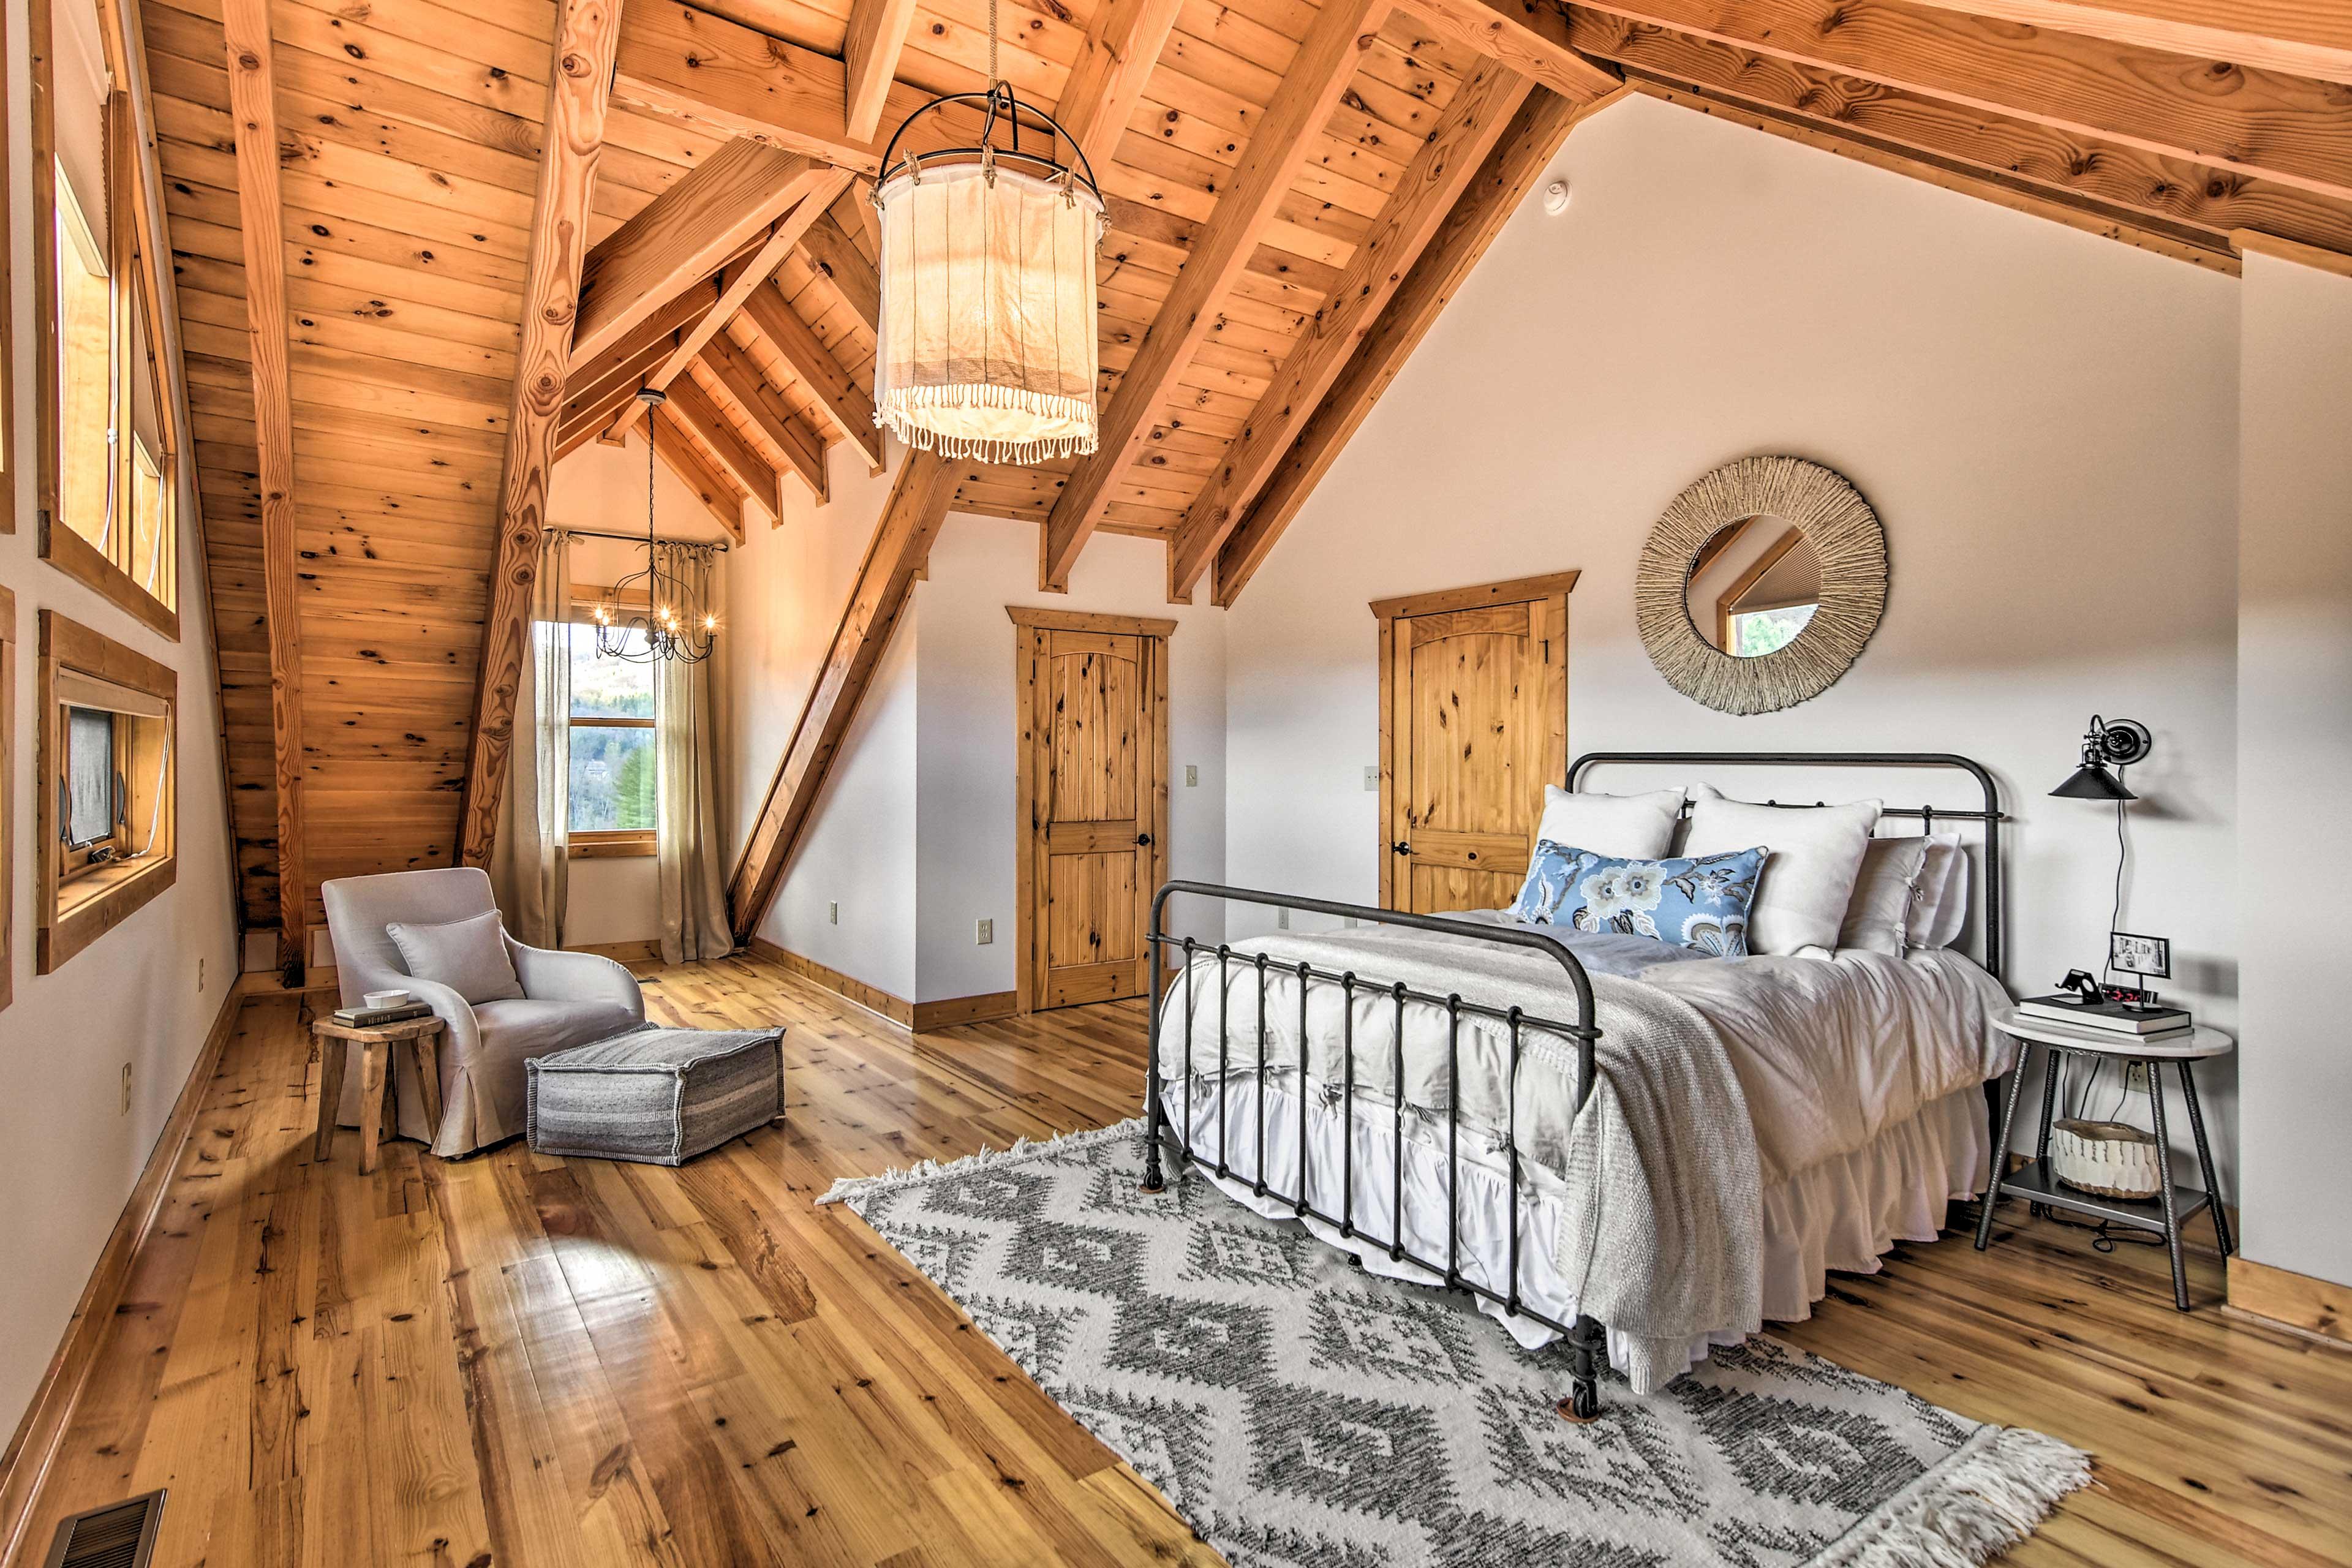 Sleek hardwood floors & ceilings give the home a cabin-like atmosphere.